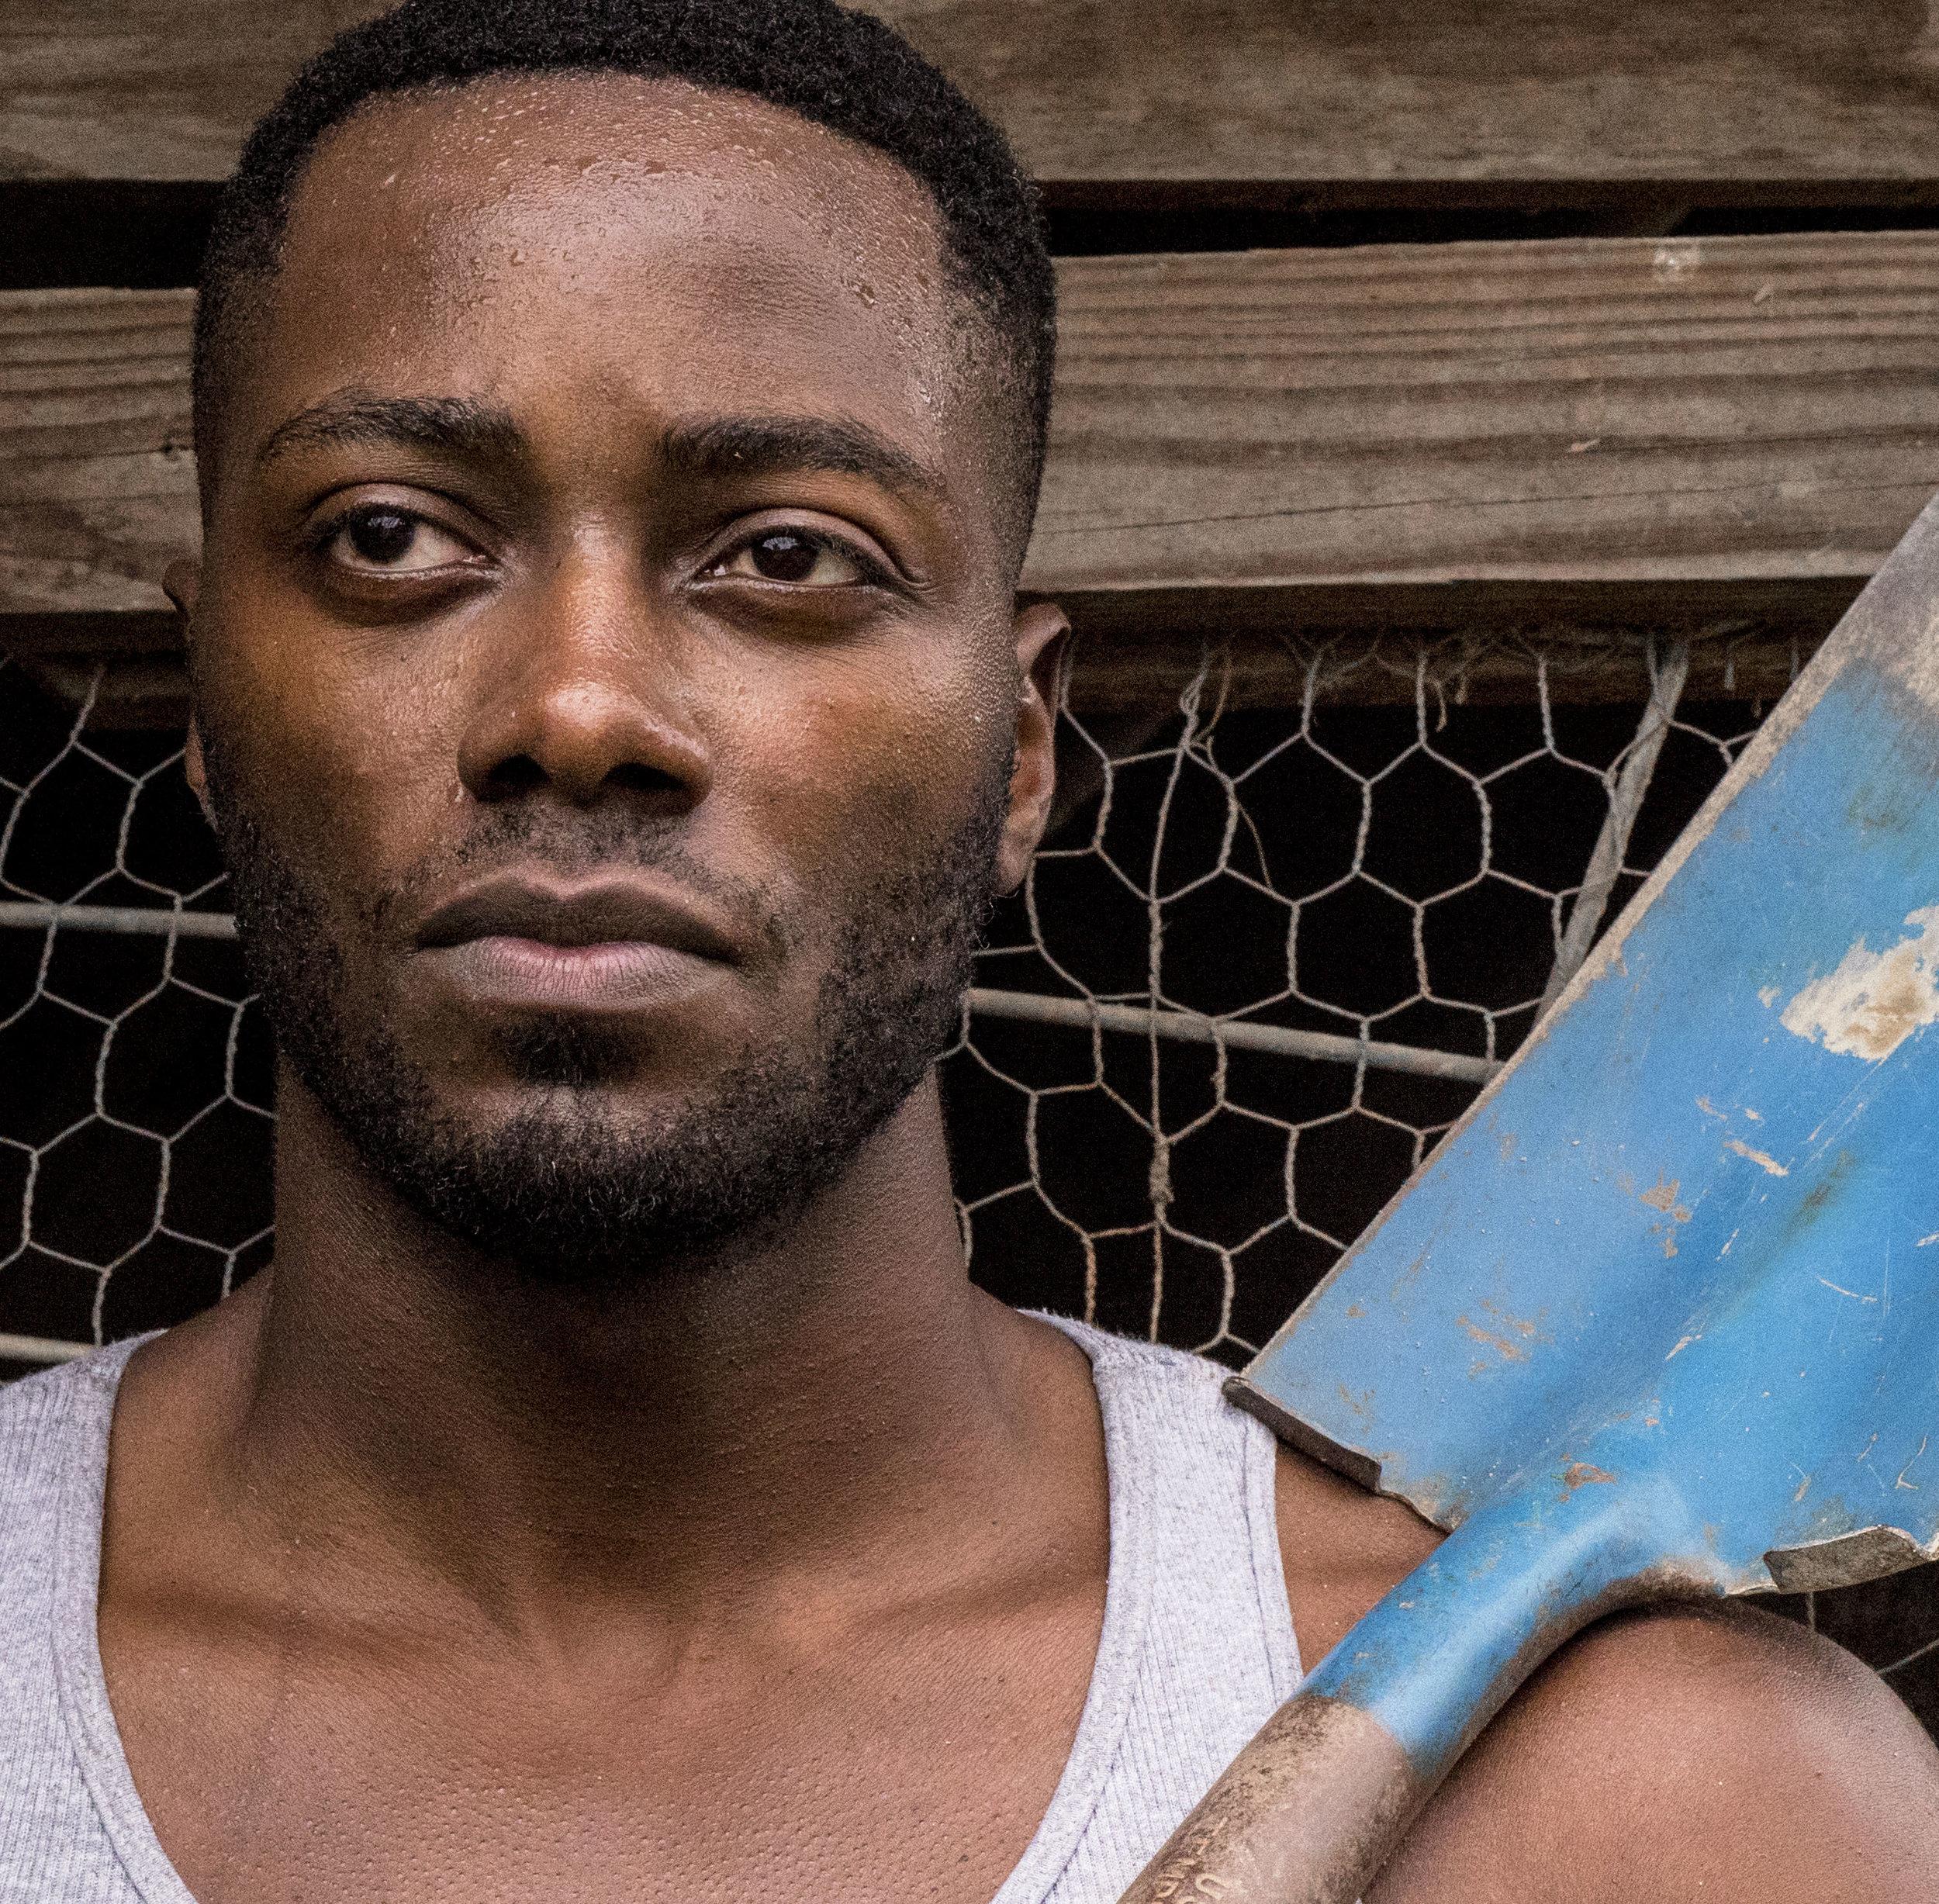 MFA Actor Marlon Andrew Burnley